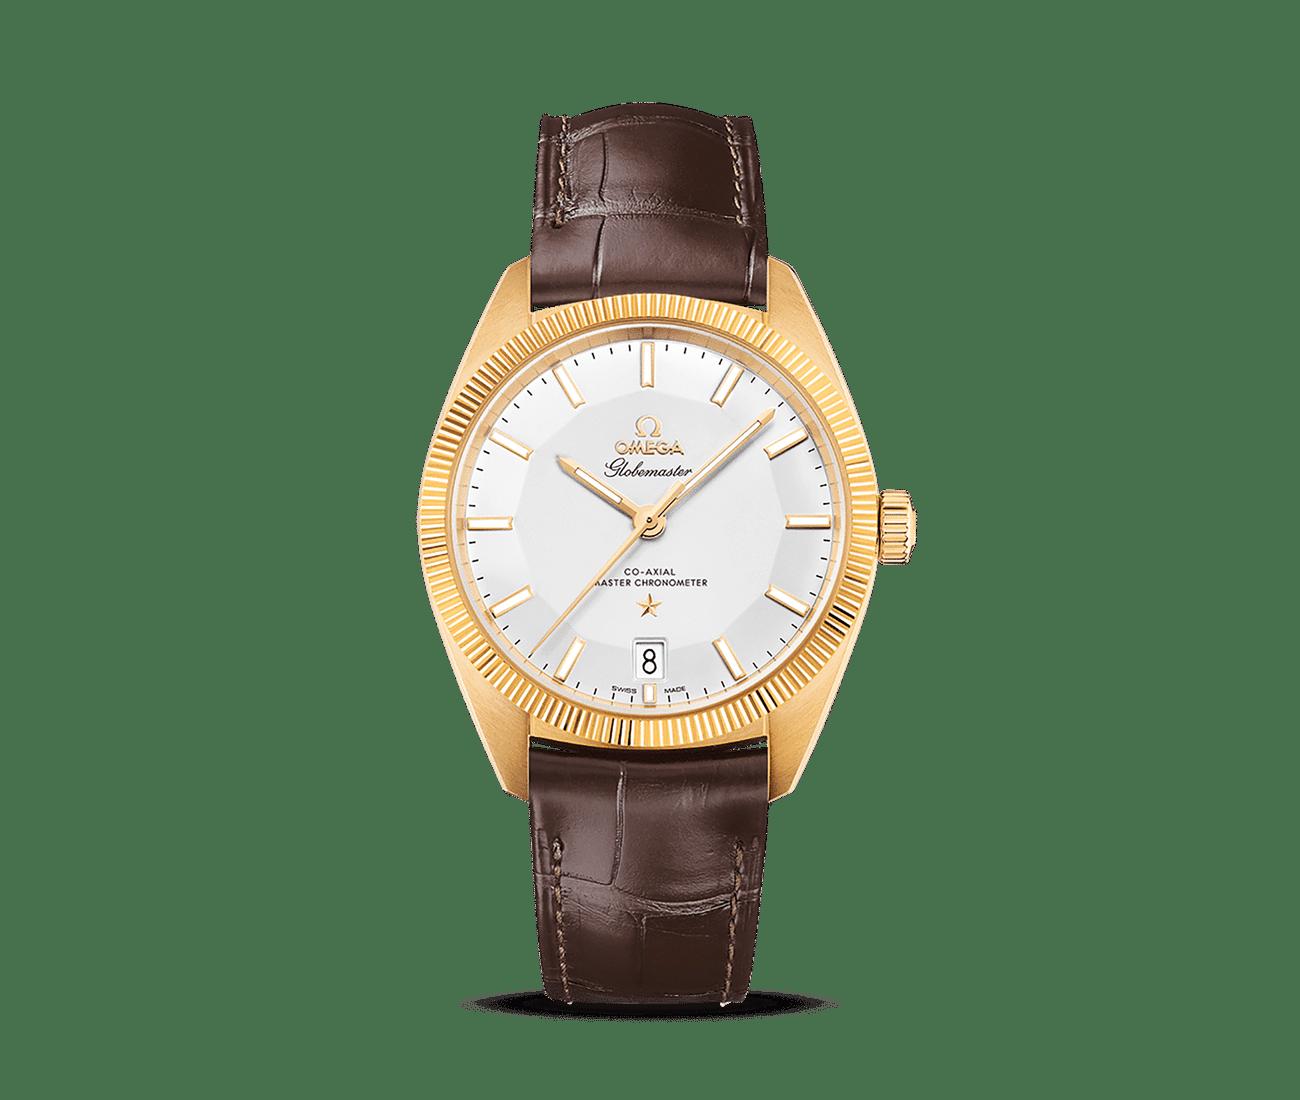 Constellation Globemaster Omega Co-Axial Master Chronometer